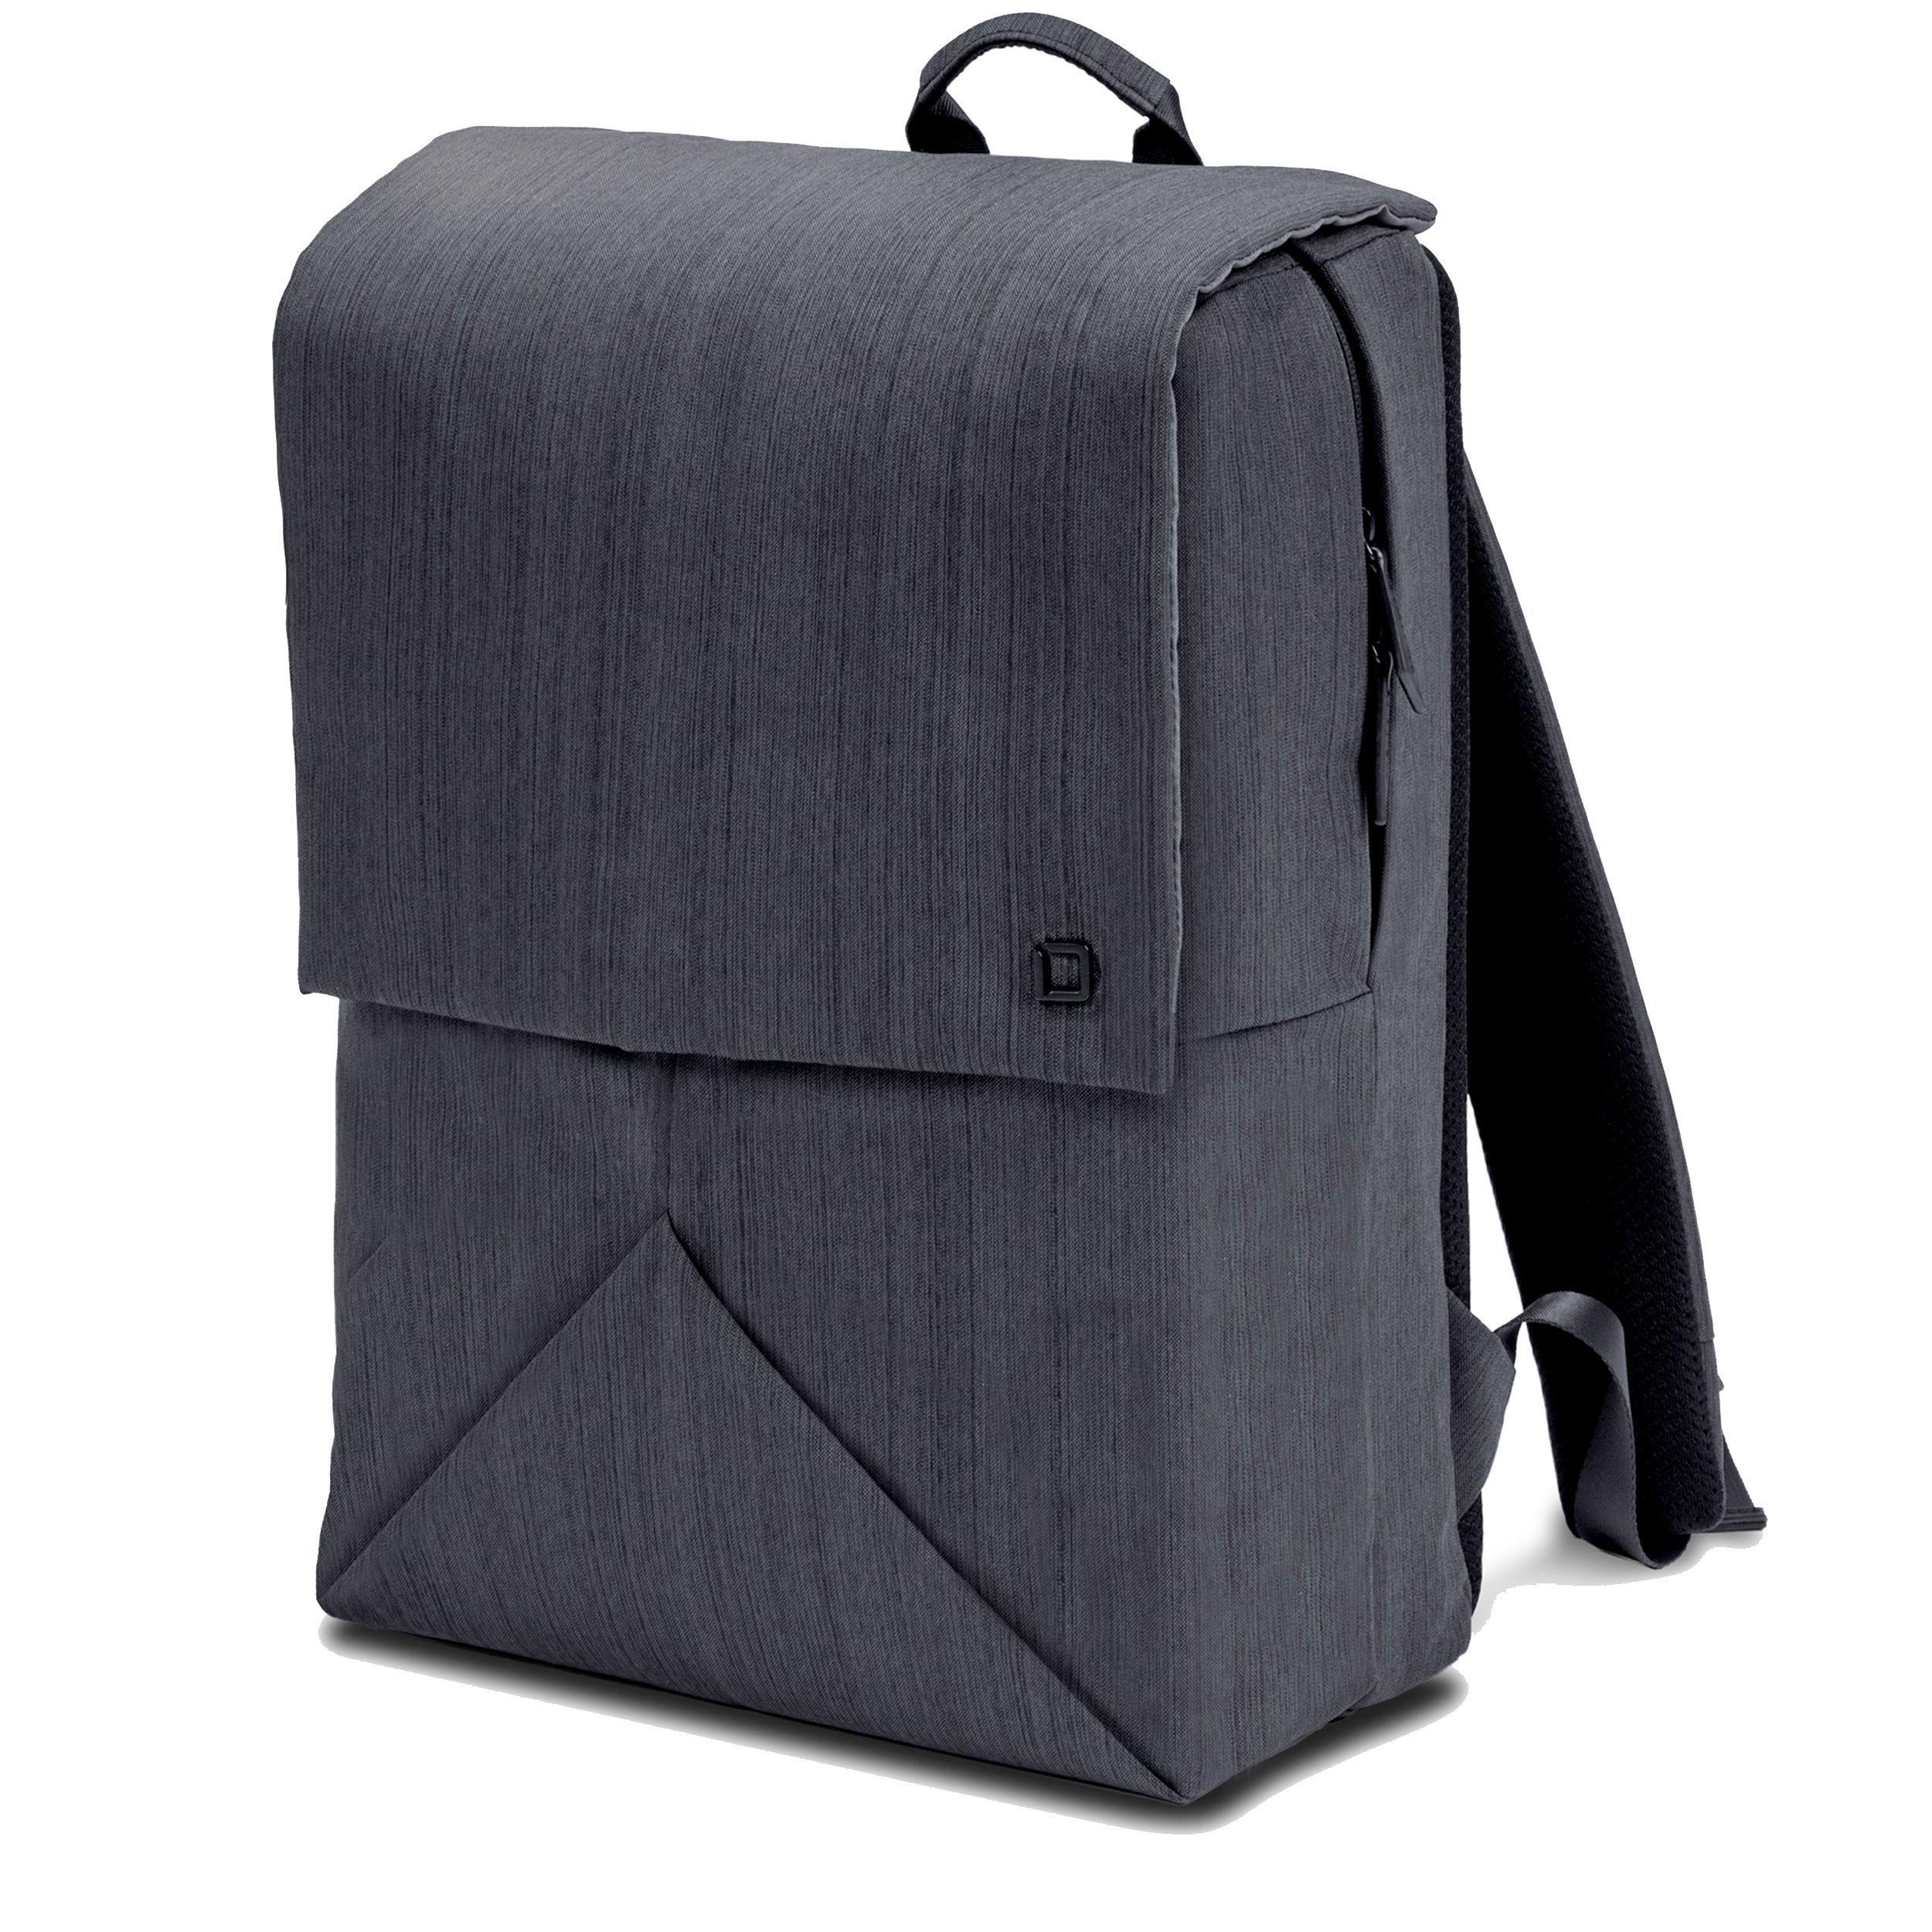 Dicota Code Backpack 11-13 13 Backpack Black - notebook cases (33 cm (13), Backpack, Black, Pol